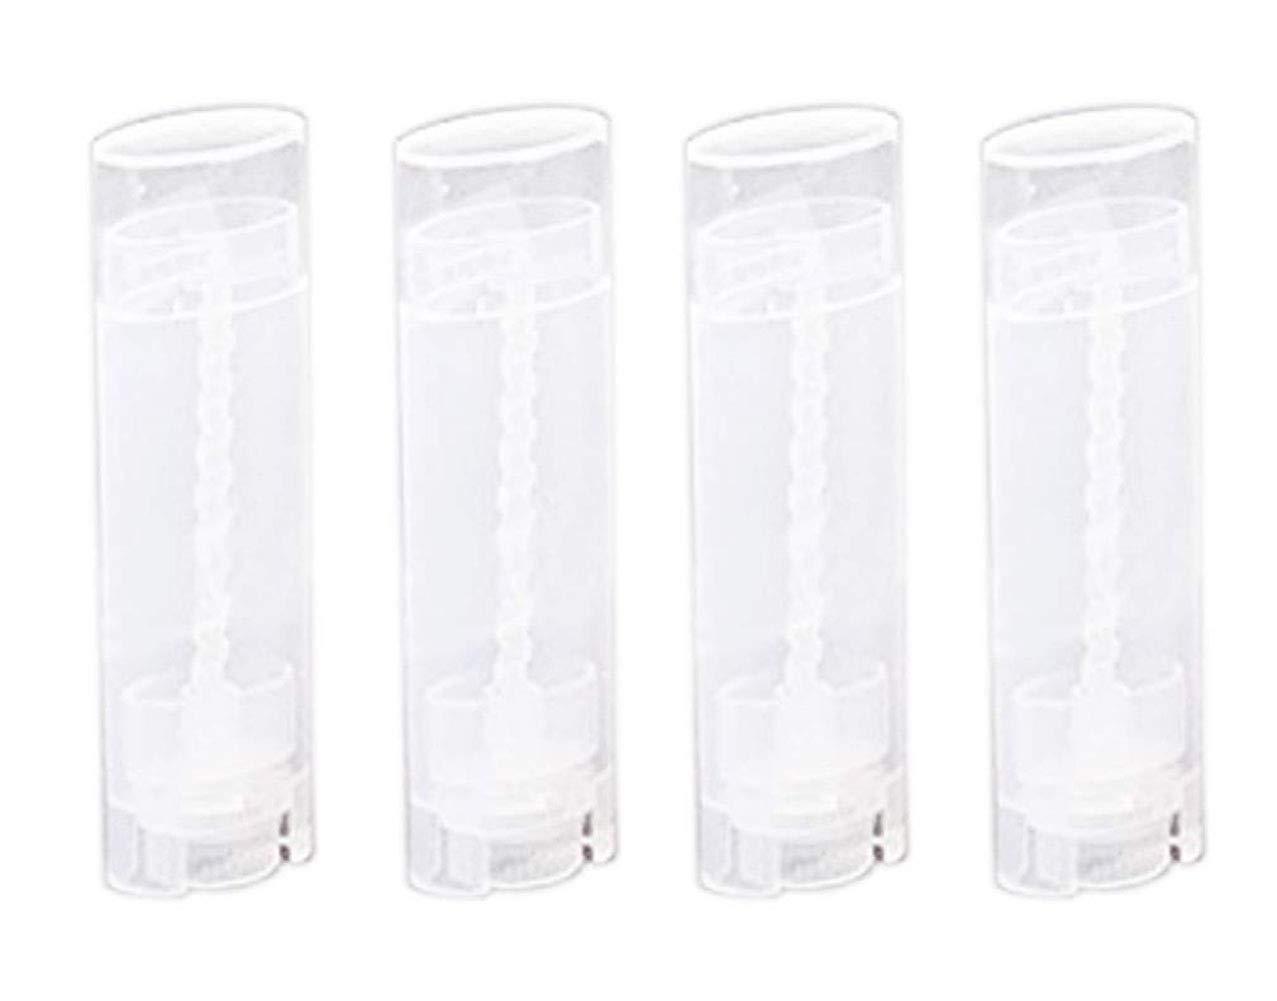 24PCS 5ML BPA Free Transparent Empty Plastic Oval Lip Balm Tubes Lipstick Bottle Deodorant Containers For Lip Balm DIY Homemade Crayon Chapstick